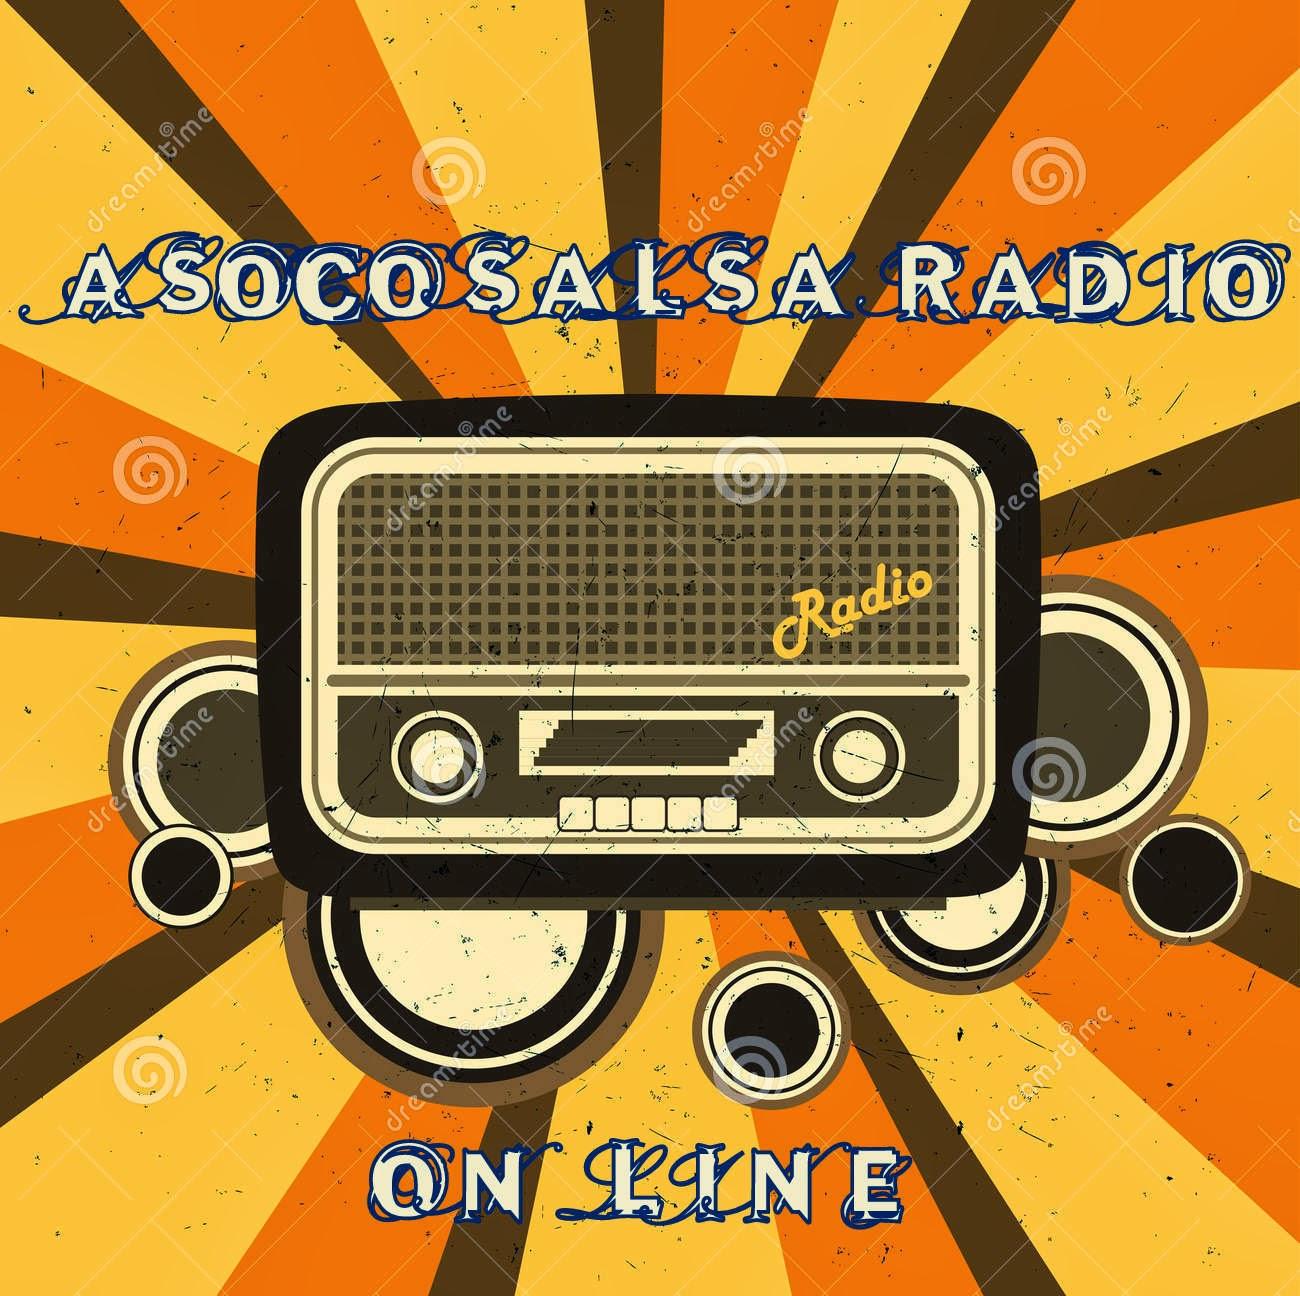 ASOCOSALSA RADIO